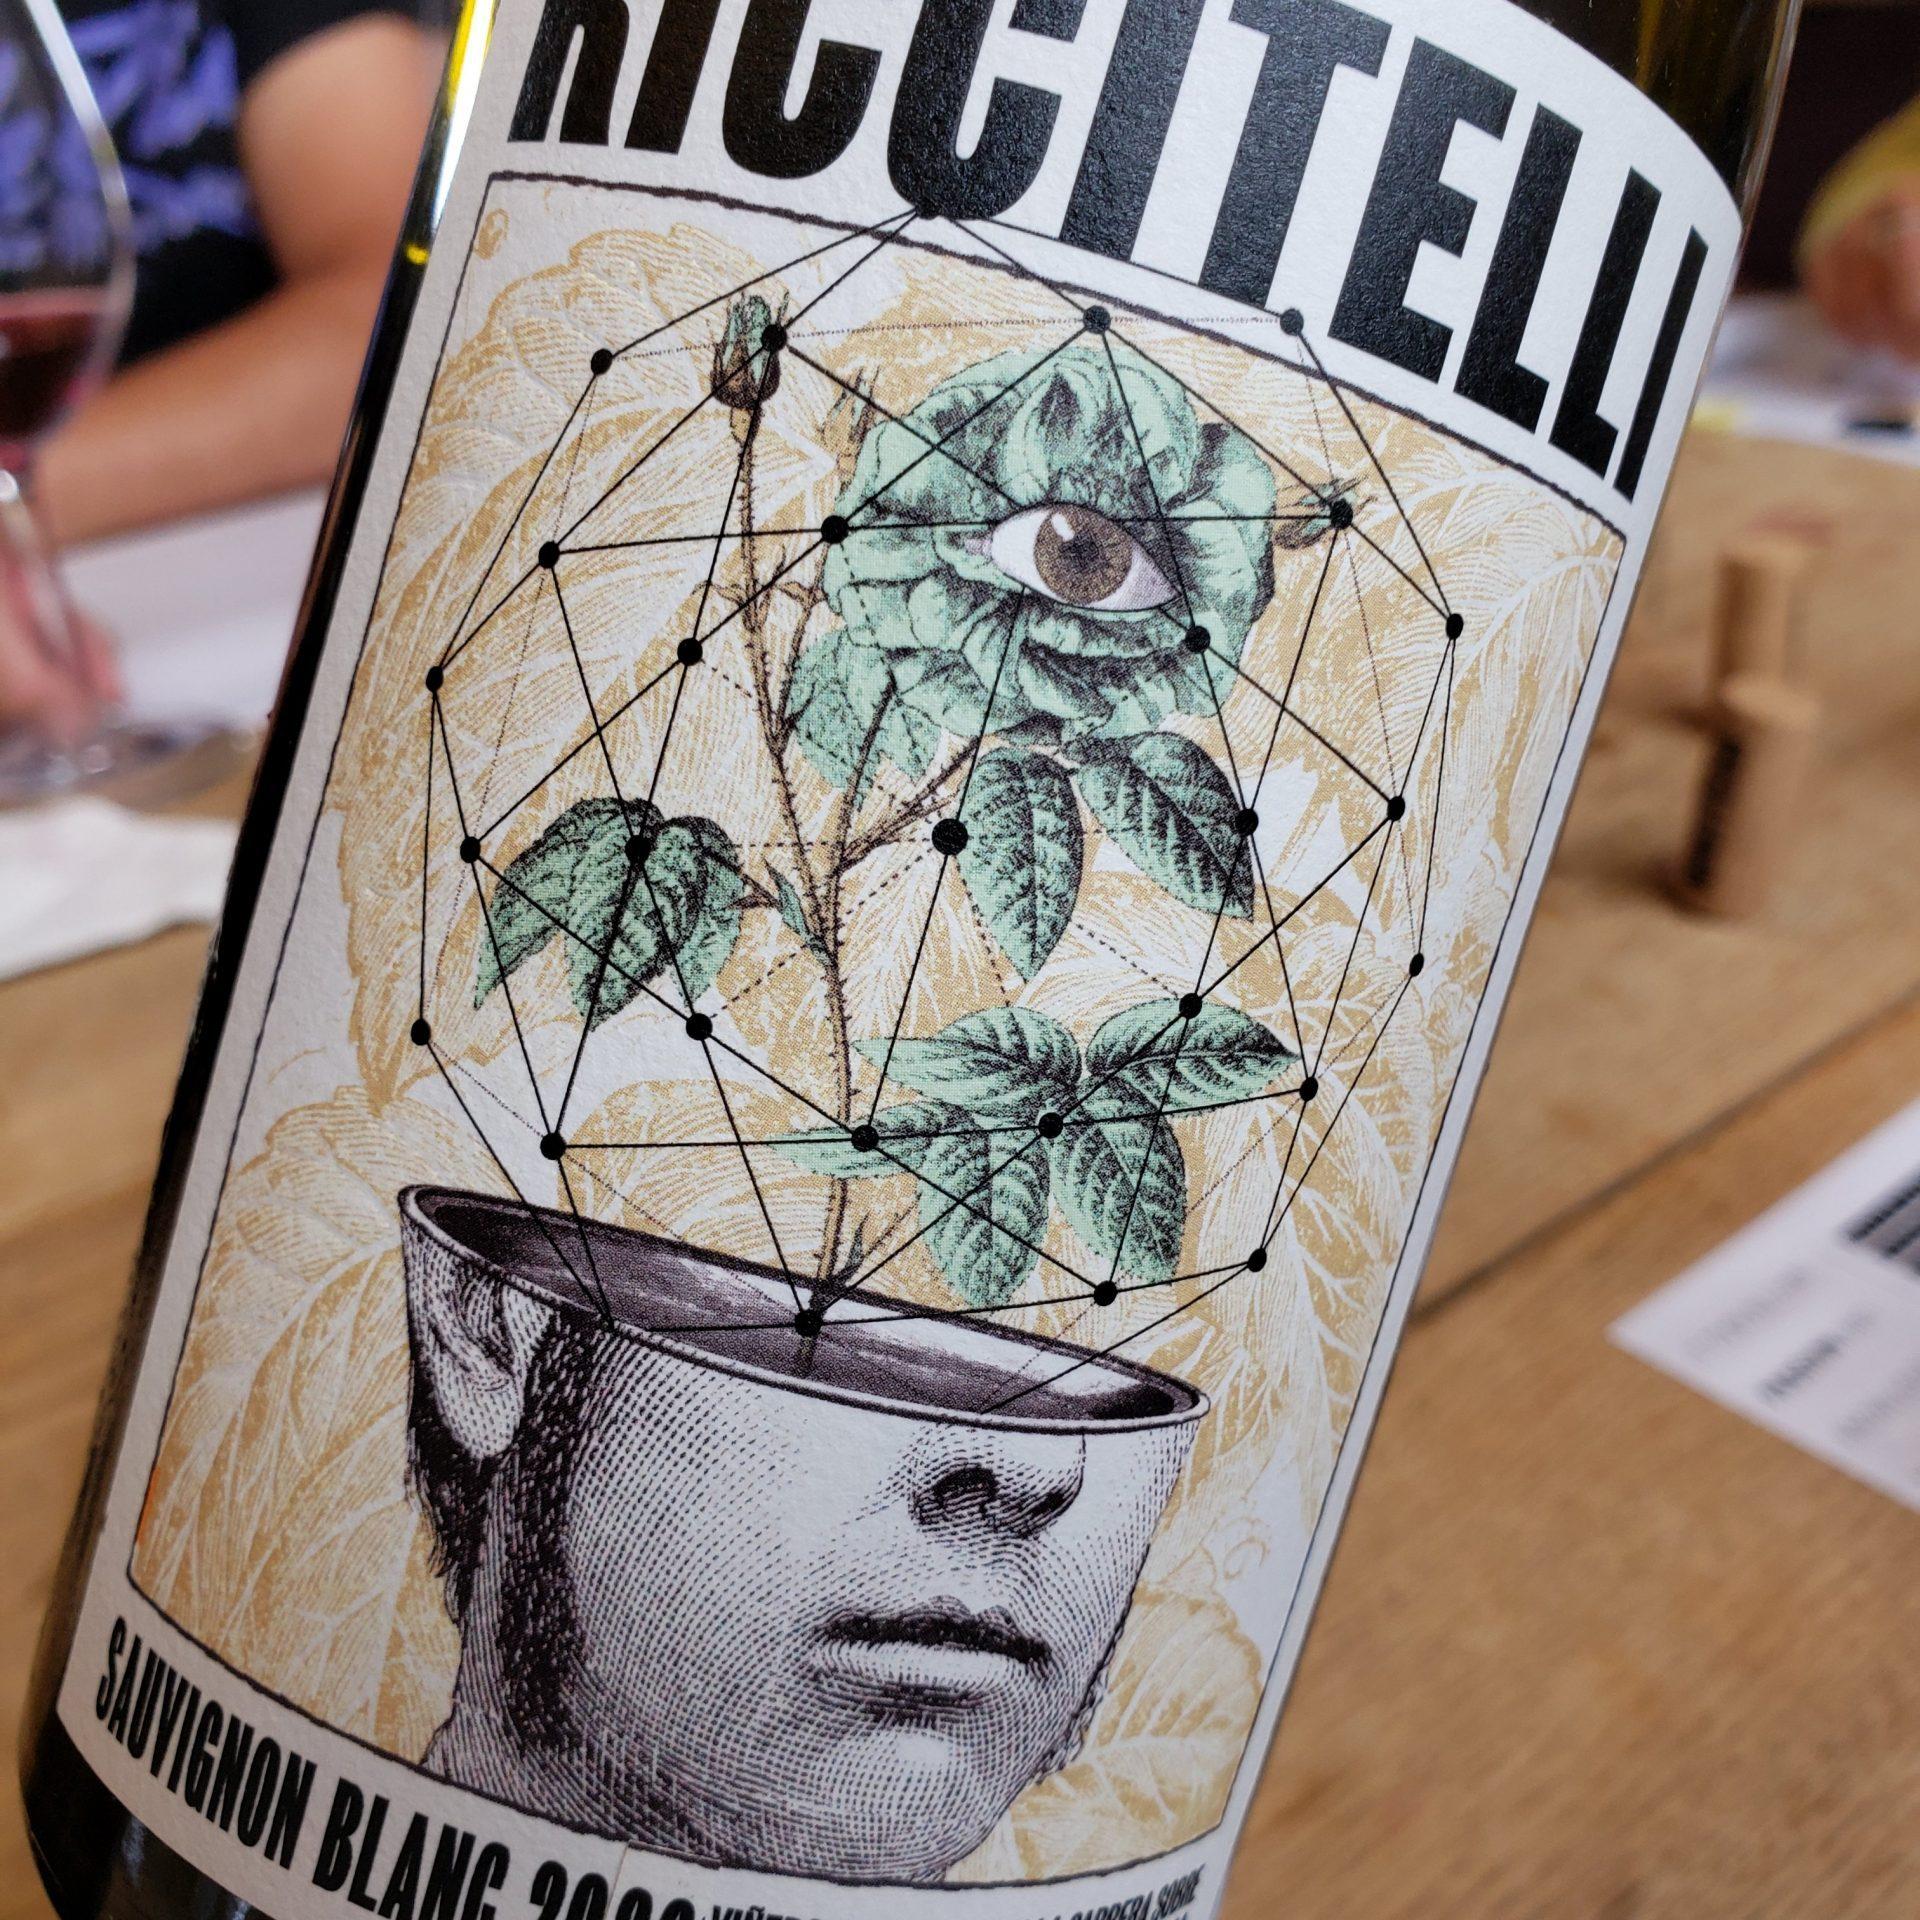 Riccitelli Bistró, la experiencia natural 4